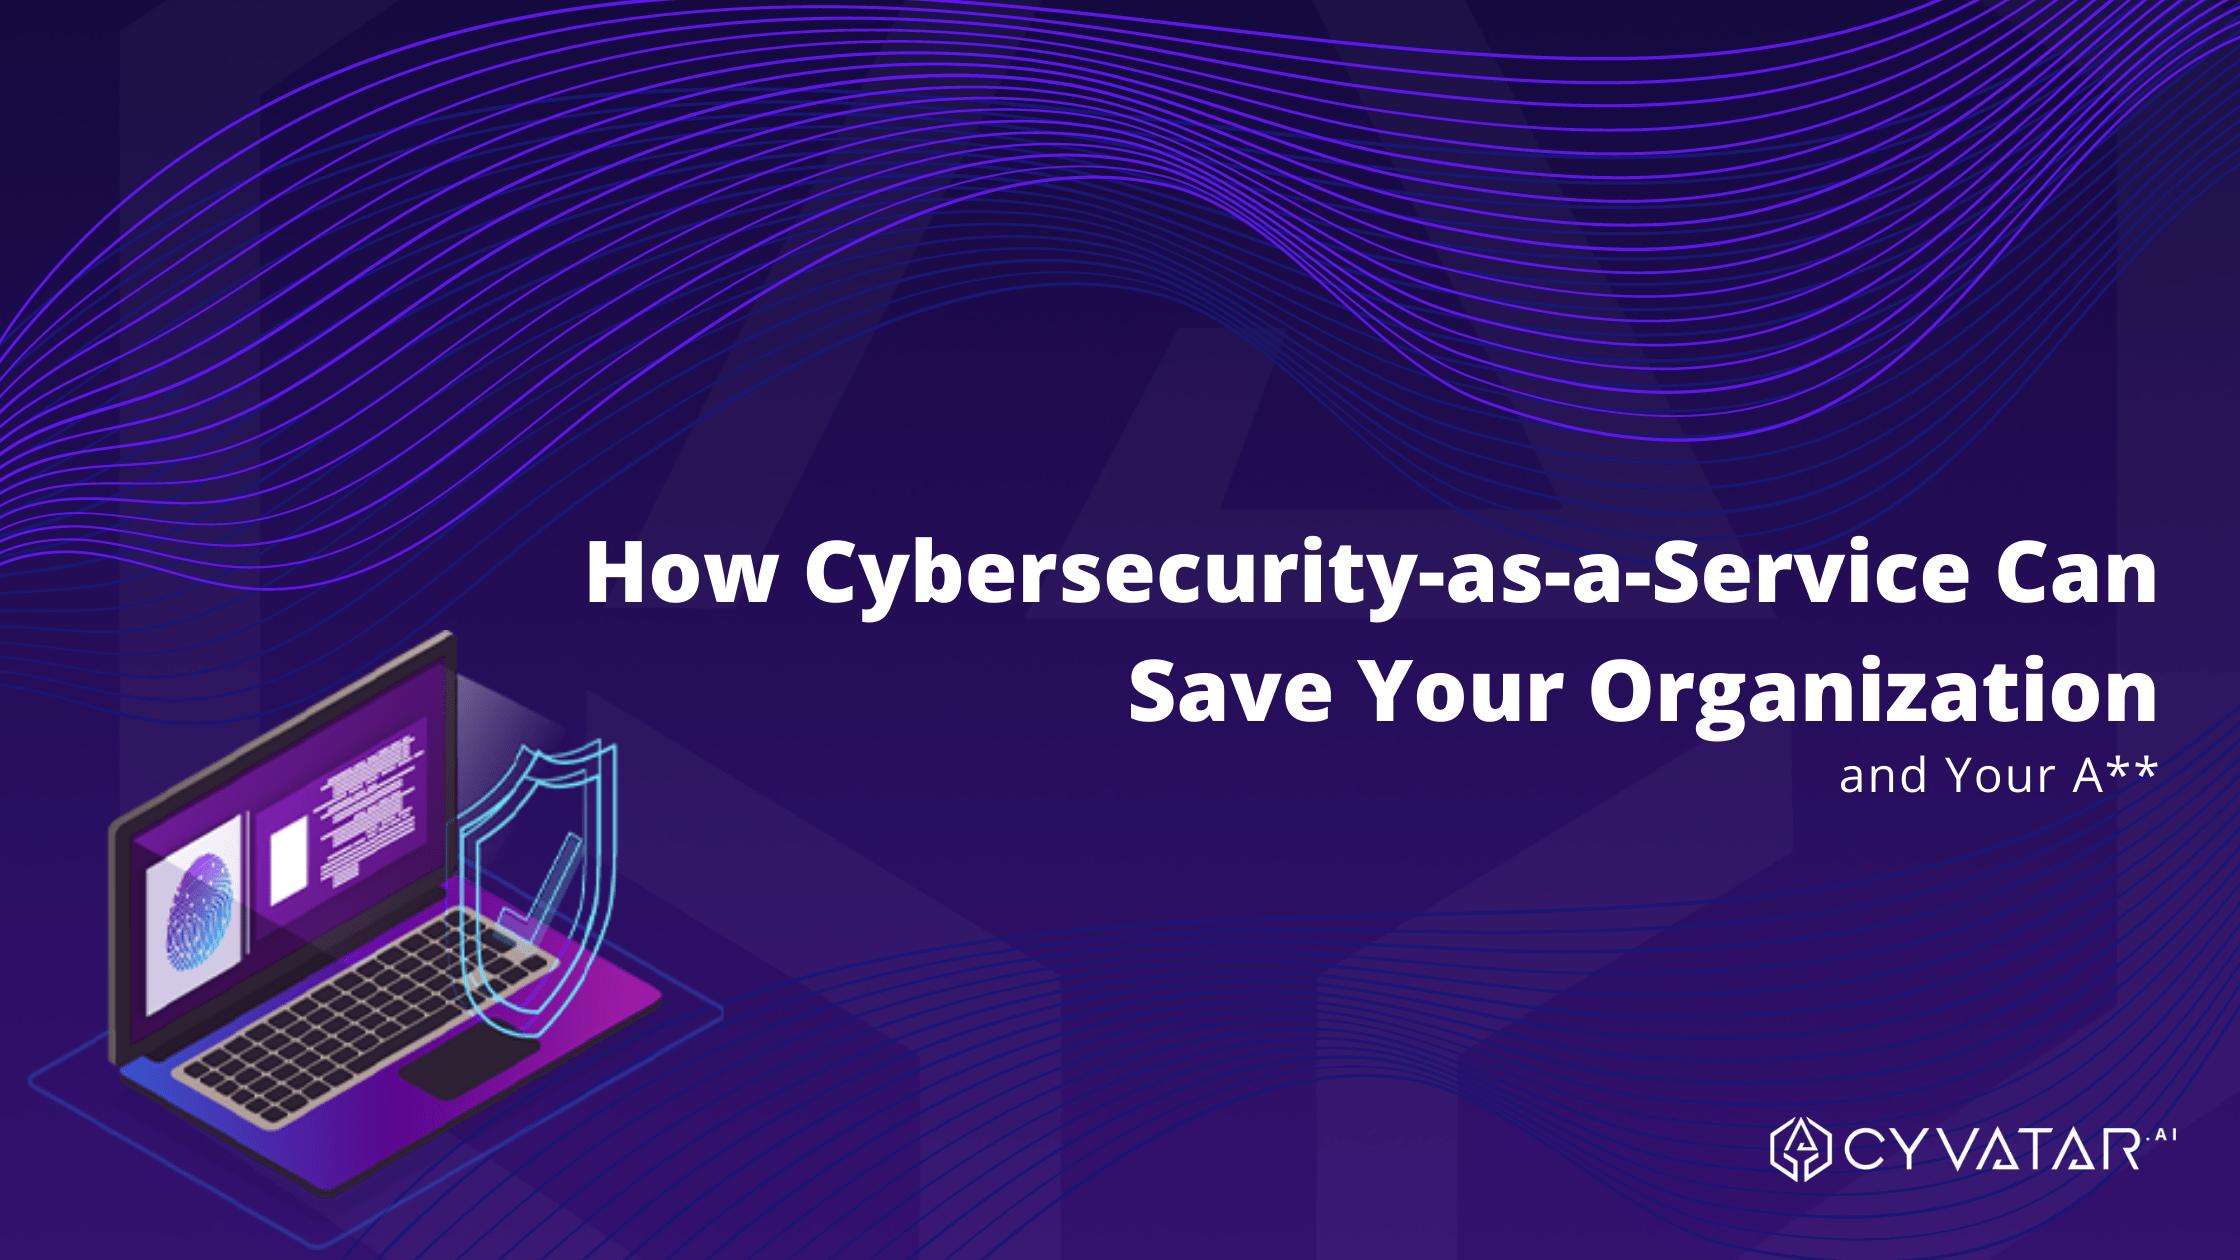 Cyvatar Cybersecurity